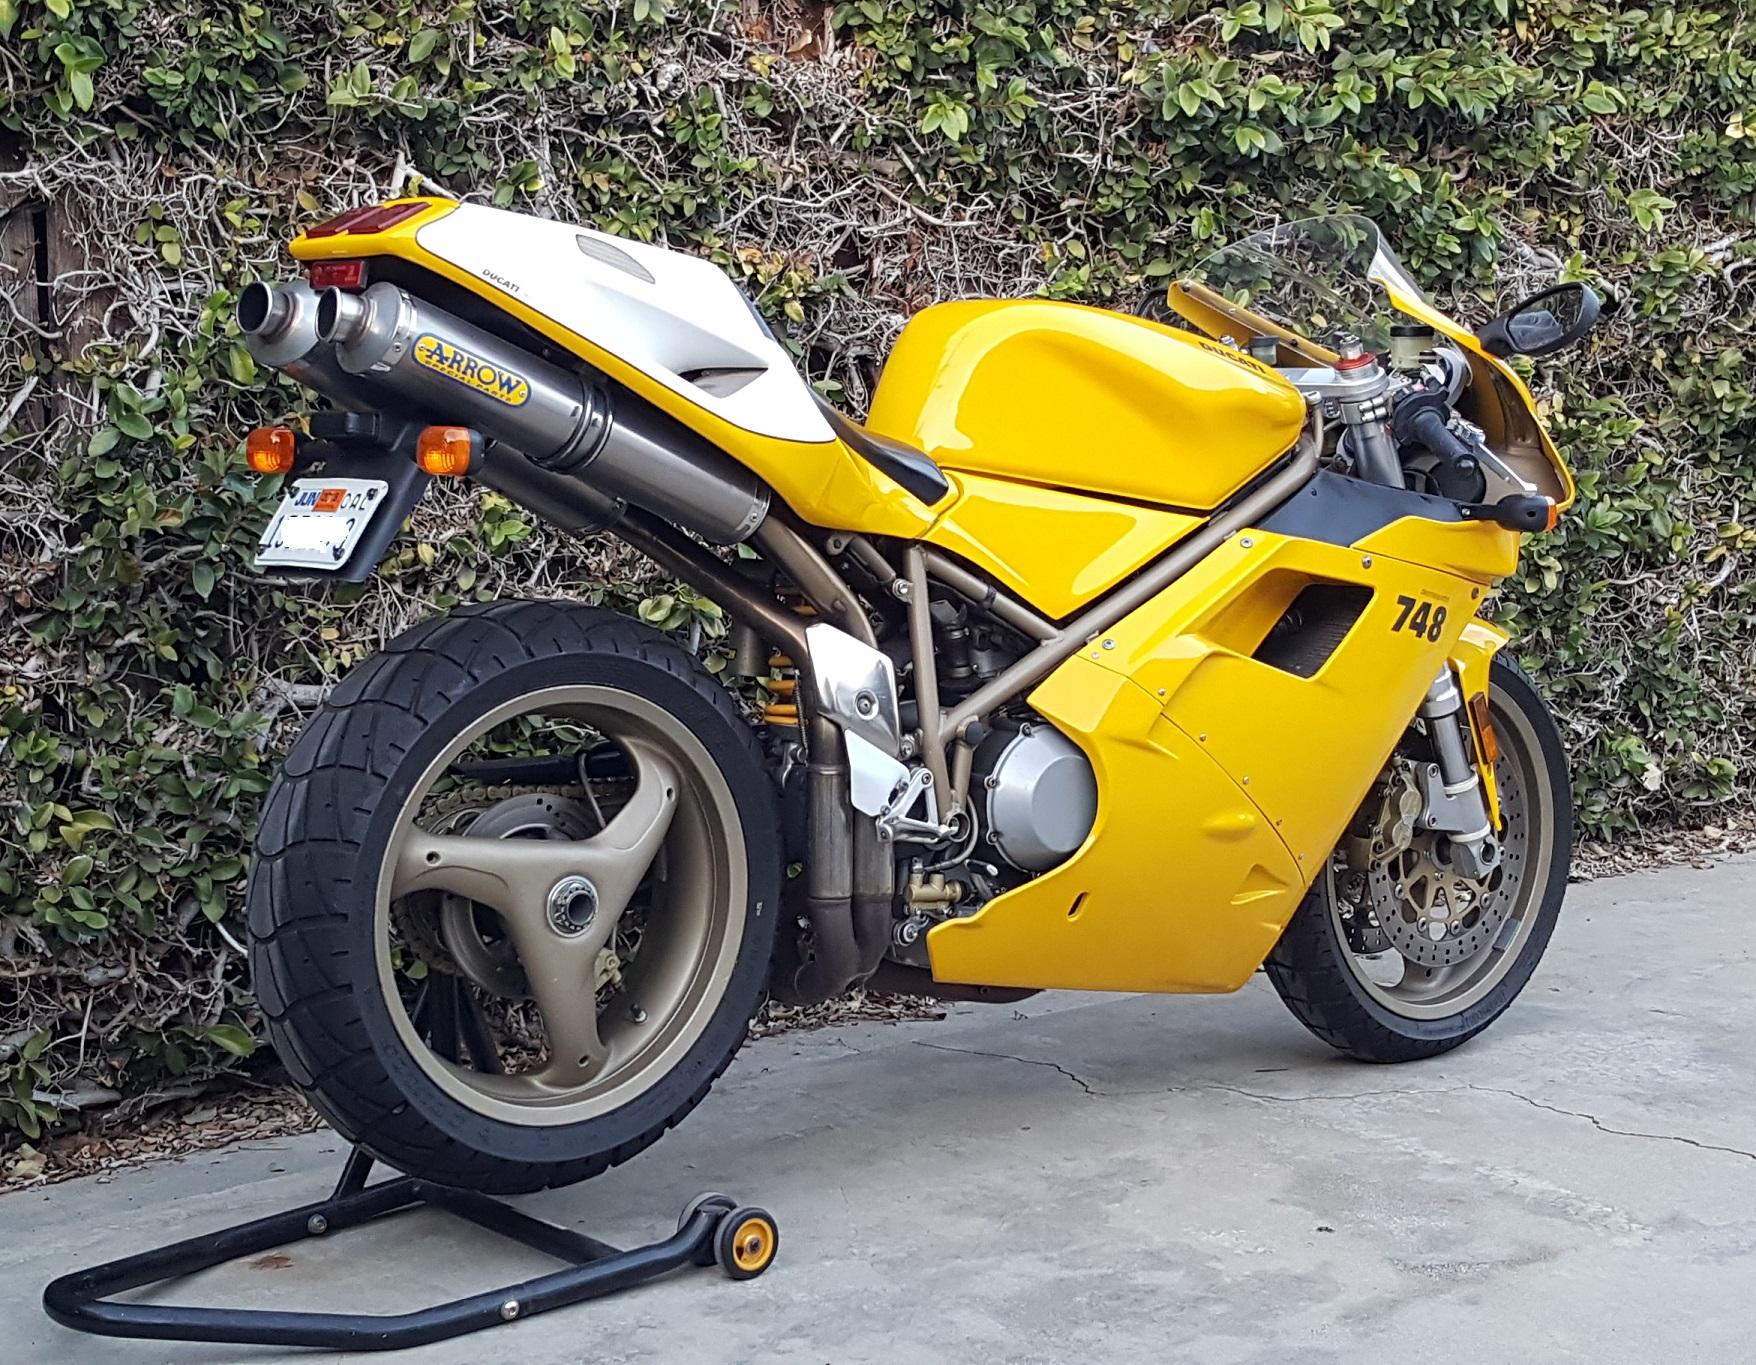 2000 Ducati 748-916 Restored7.jpg